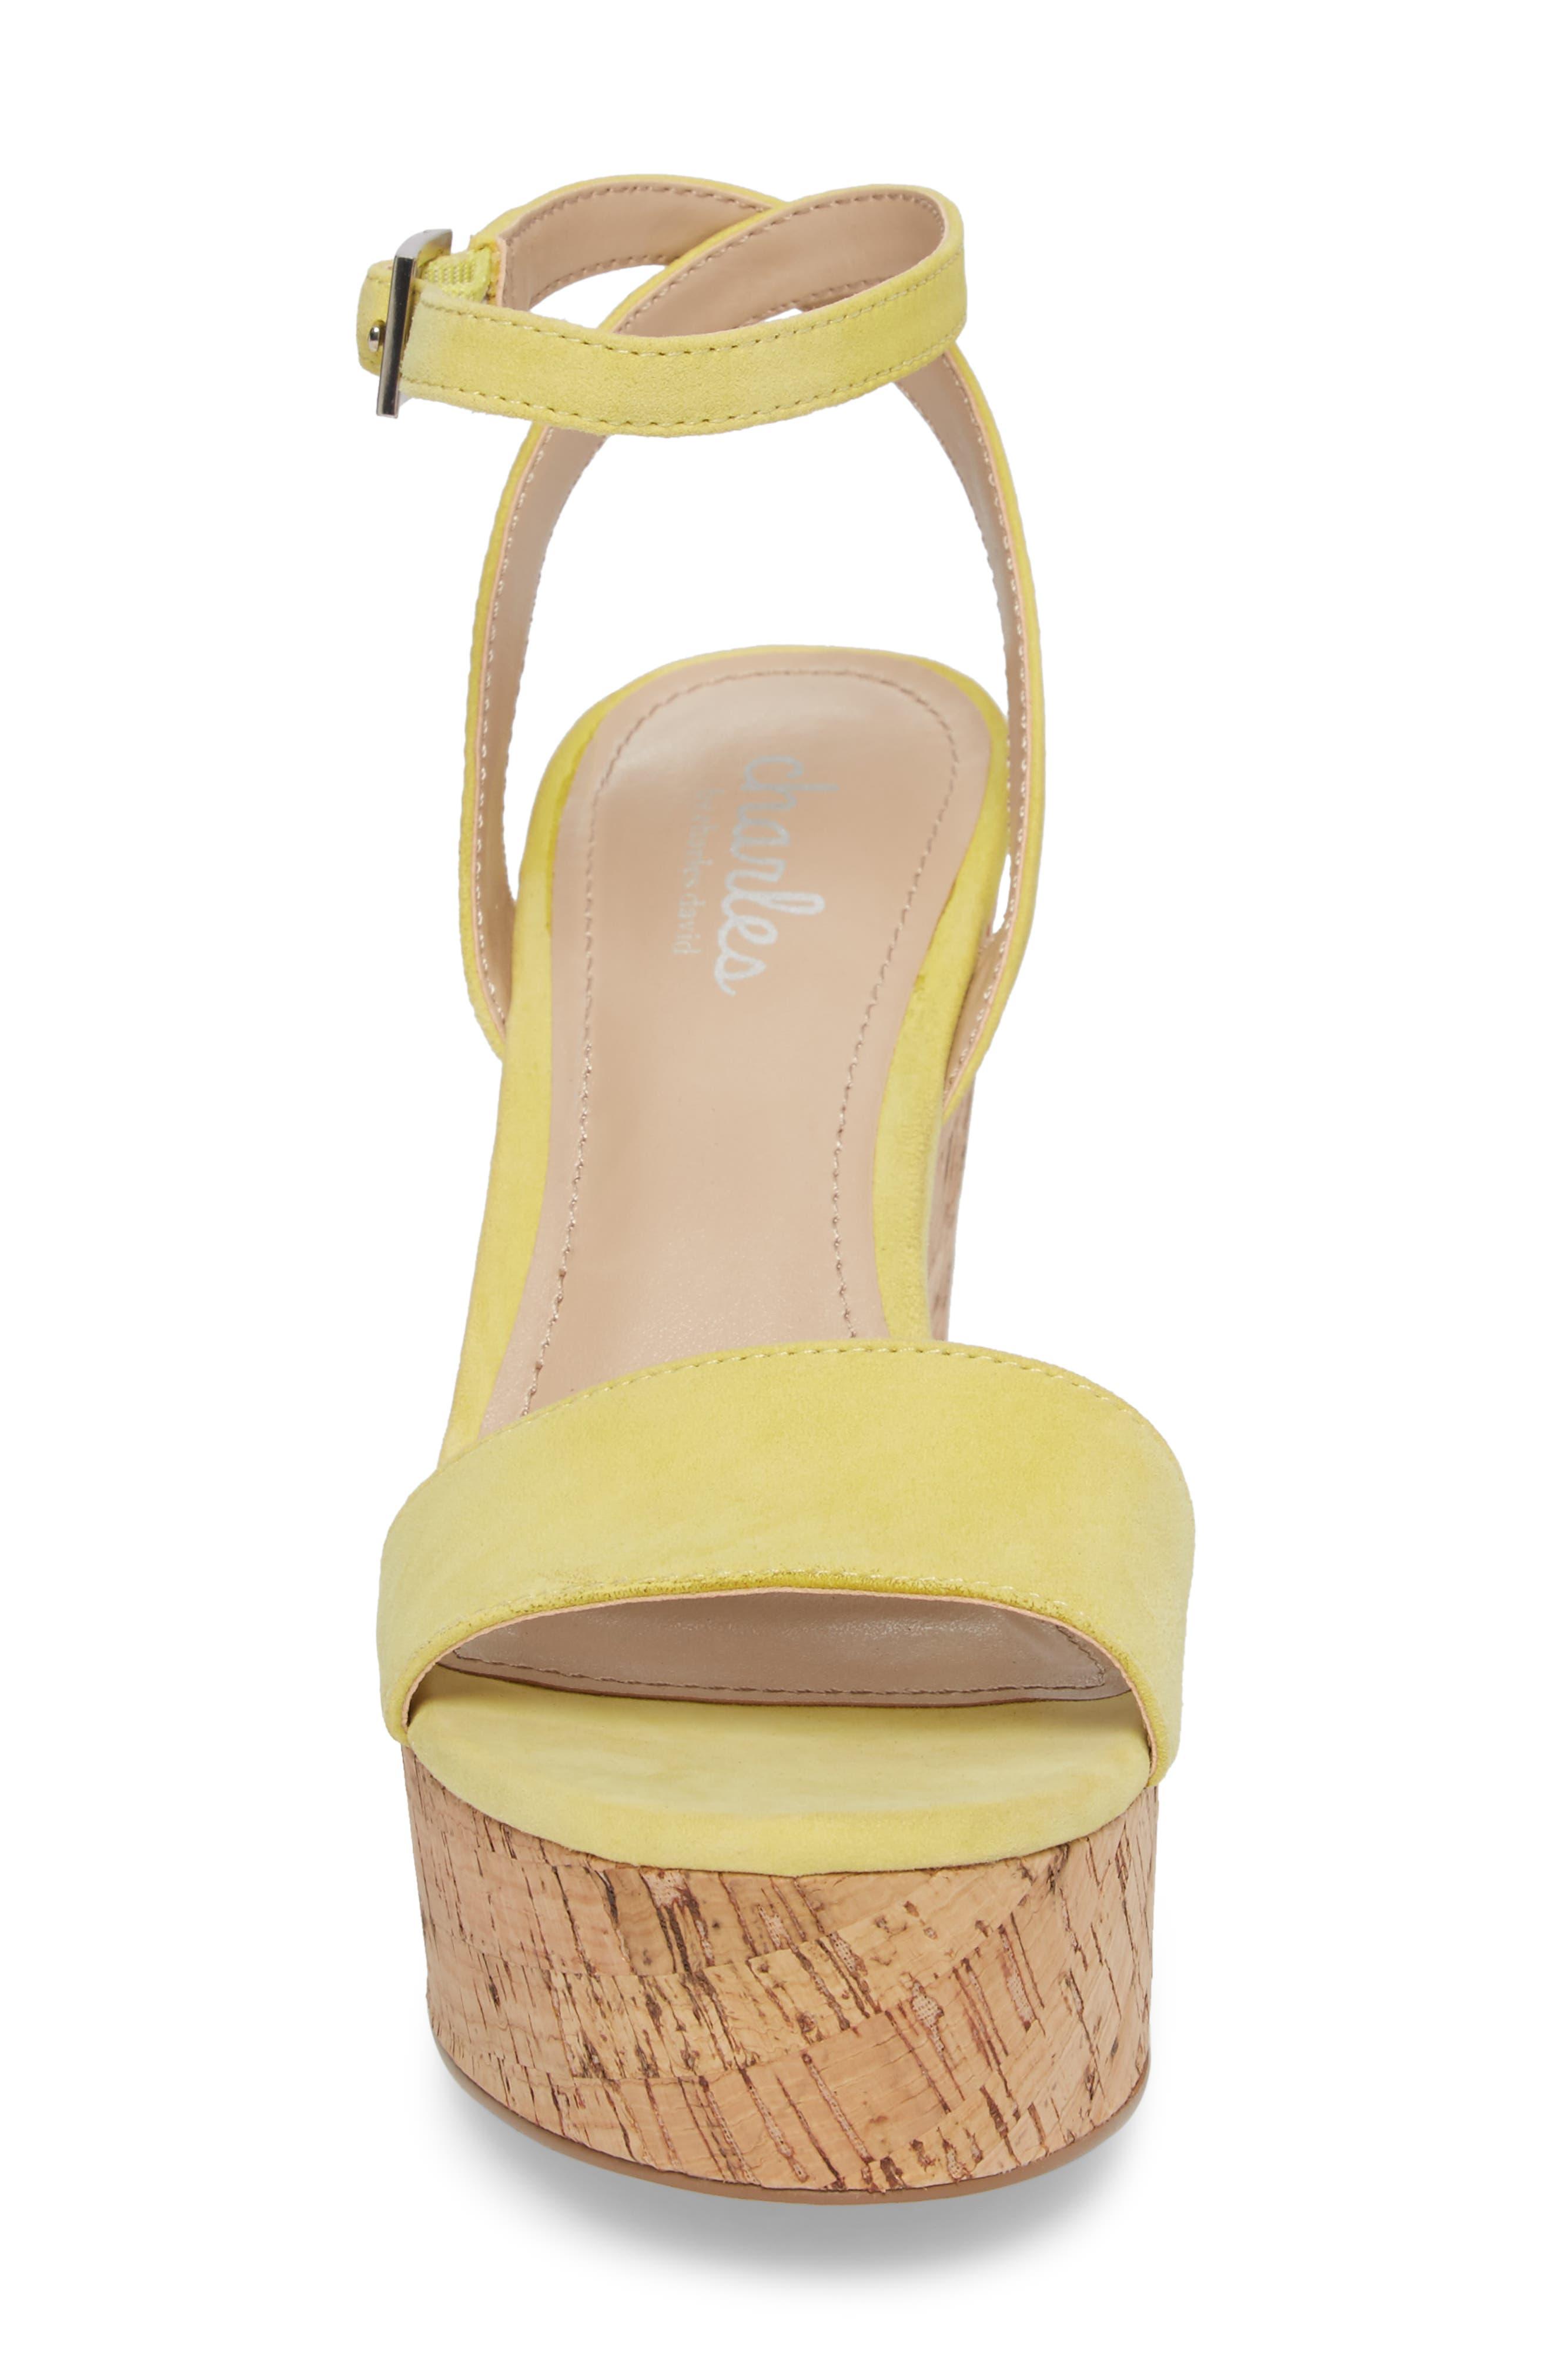 Lilla Platform Wedge Sandal,                             Alternate thumbnail 4, color,                             Yellow Suede